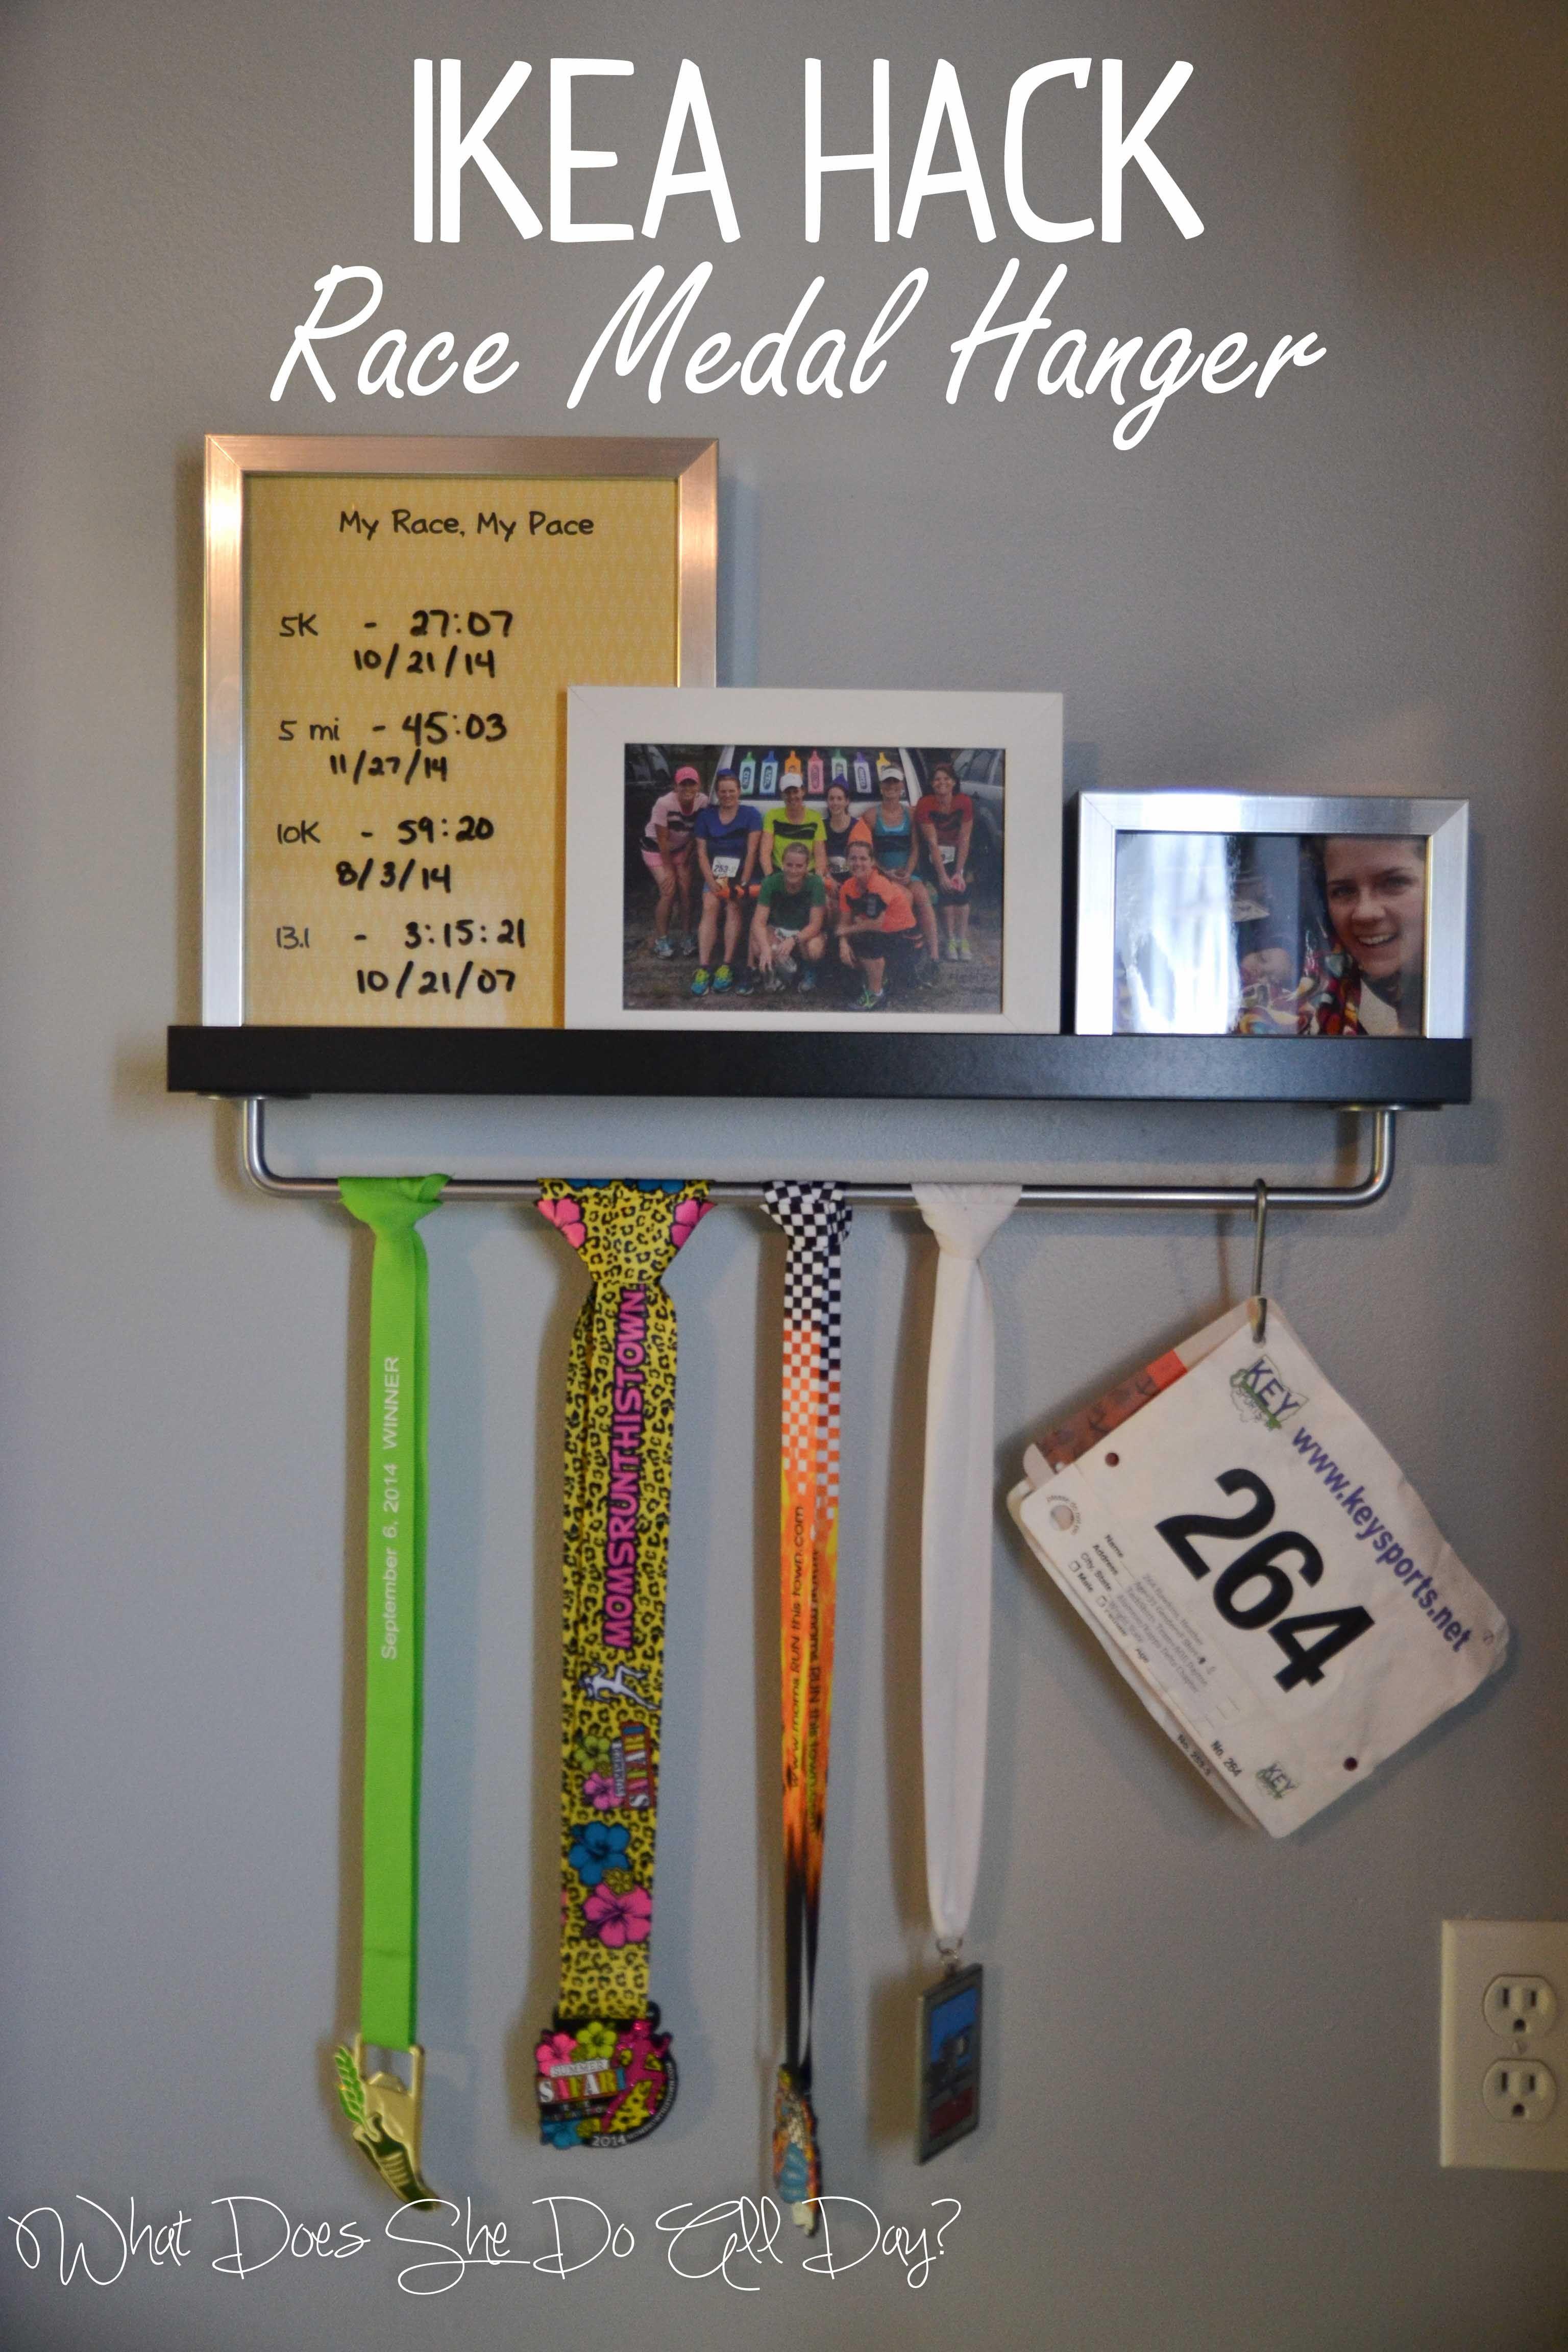 IKEA Hack: Race Medal Hanger and Shelf #ikea #running #racing More